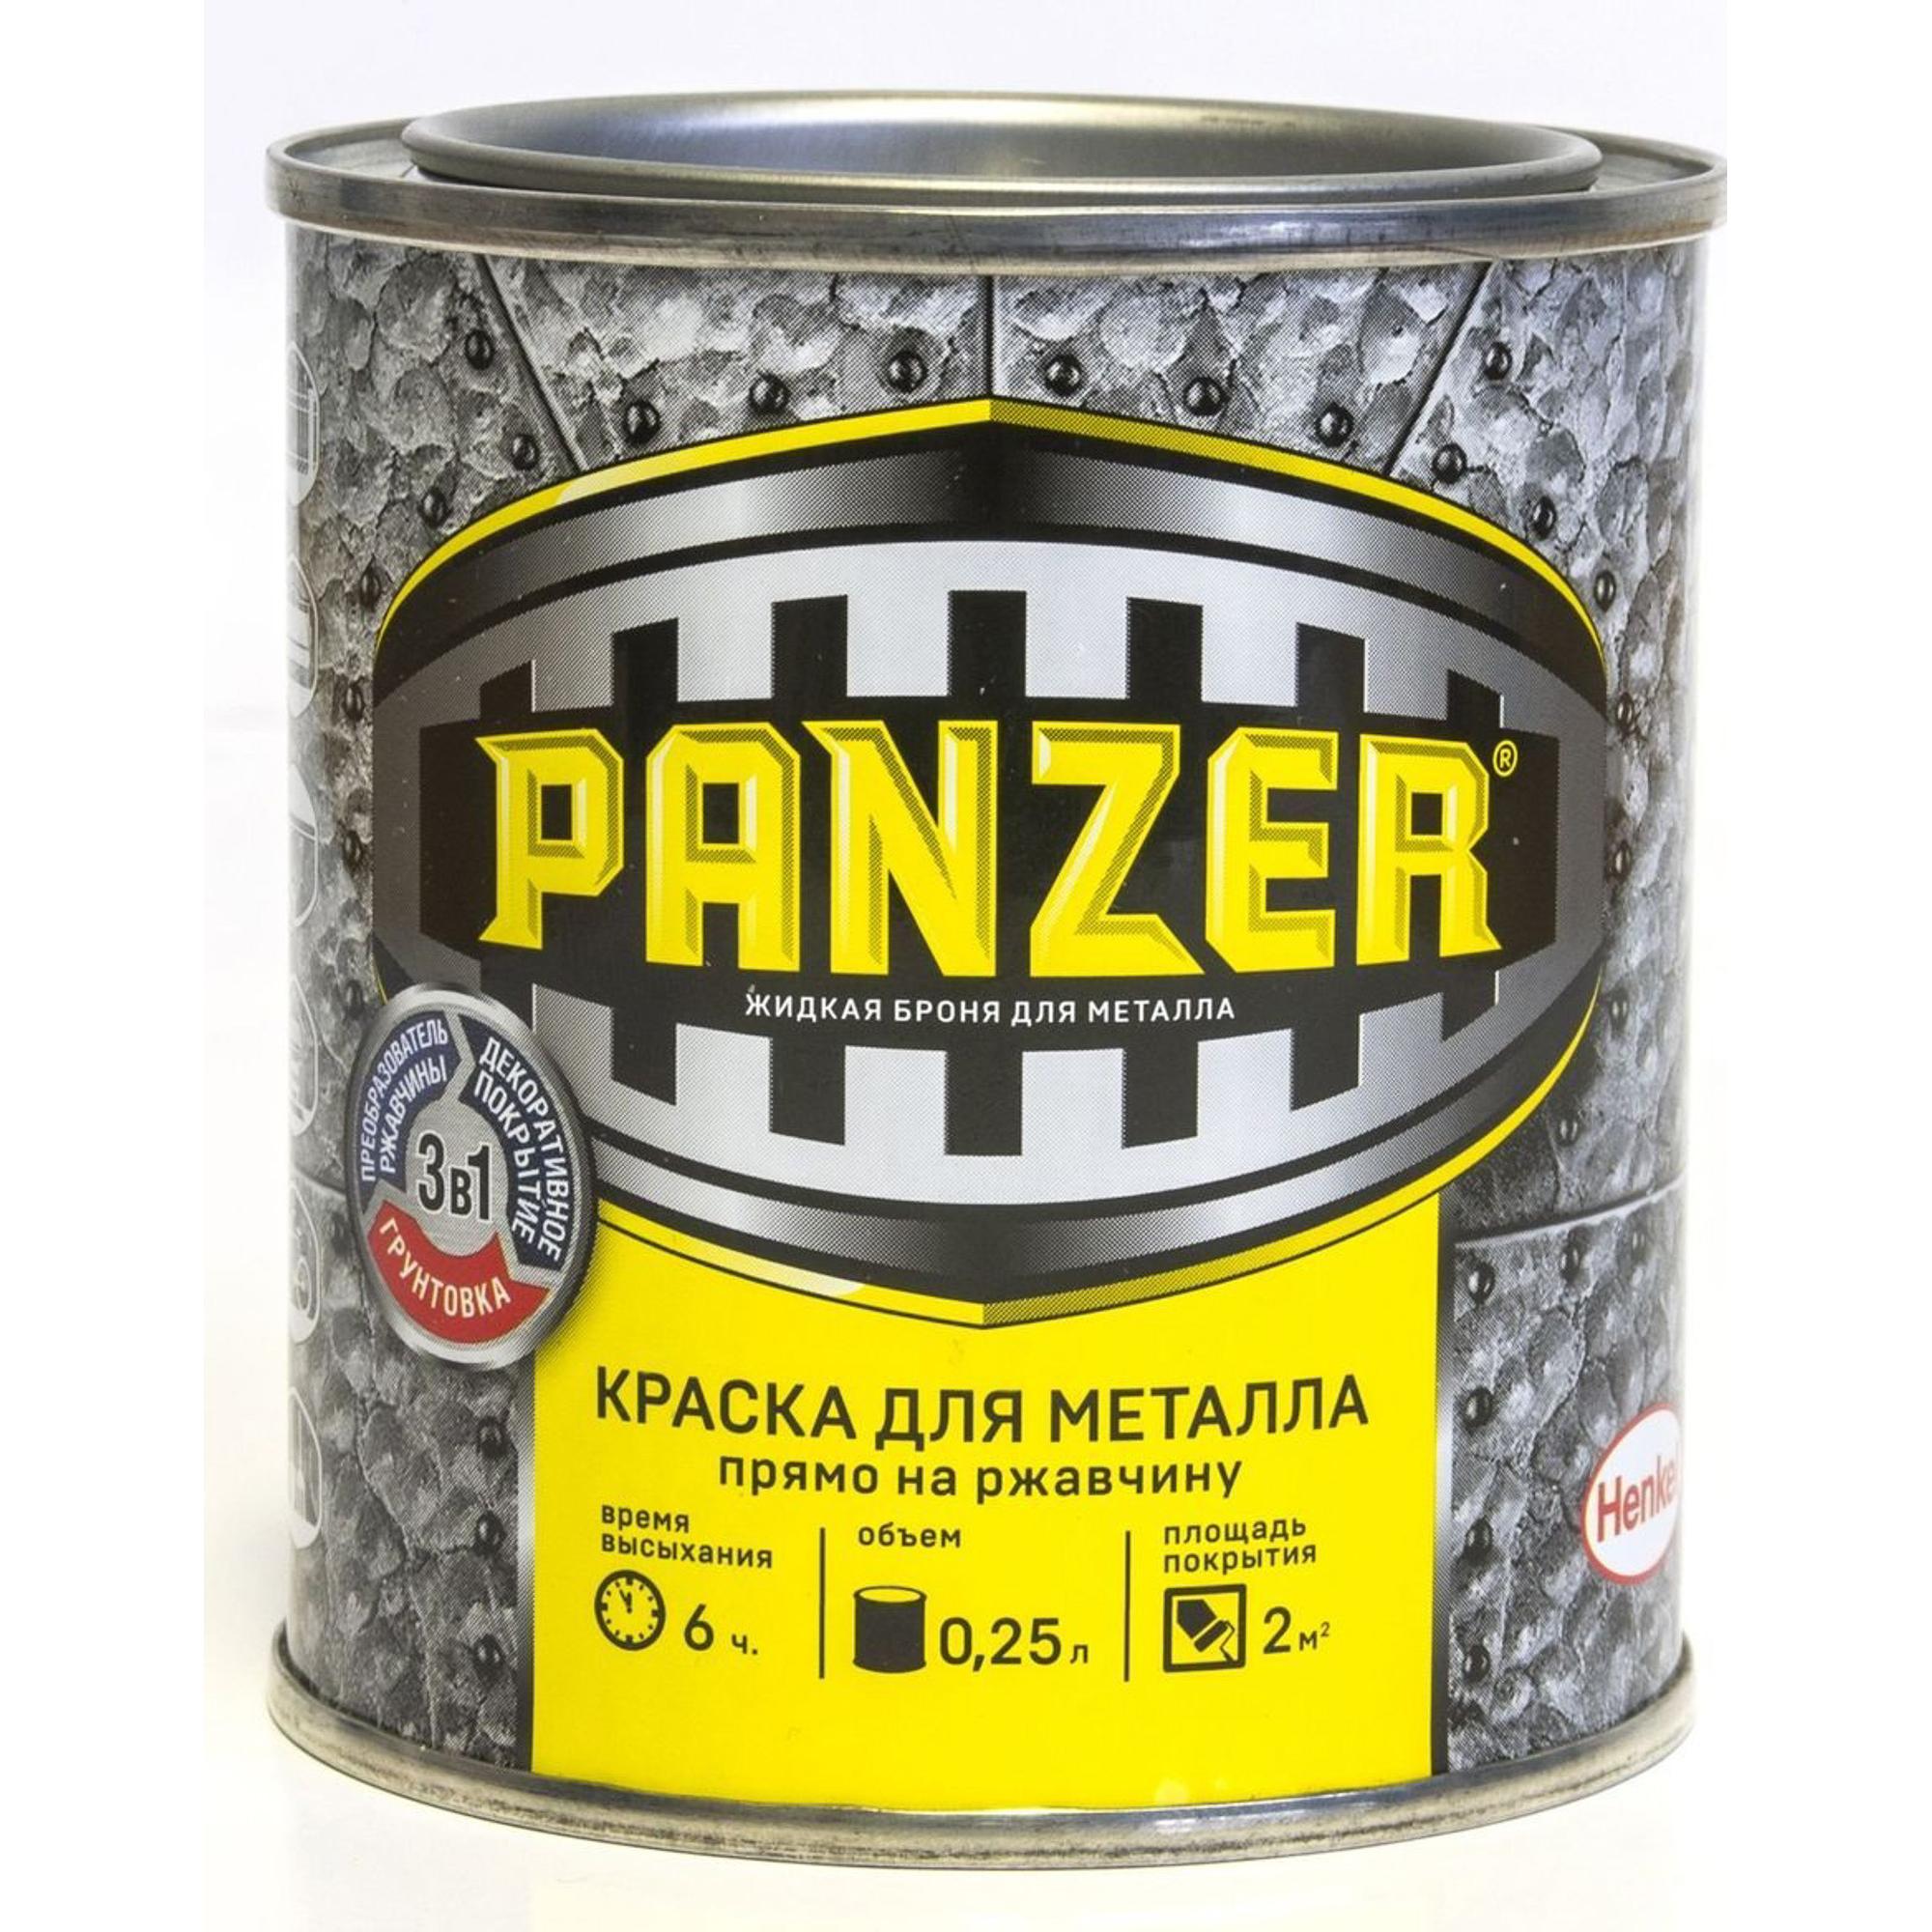 Краска для металла Panzer гладкая серебристая 0.25 л недорого